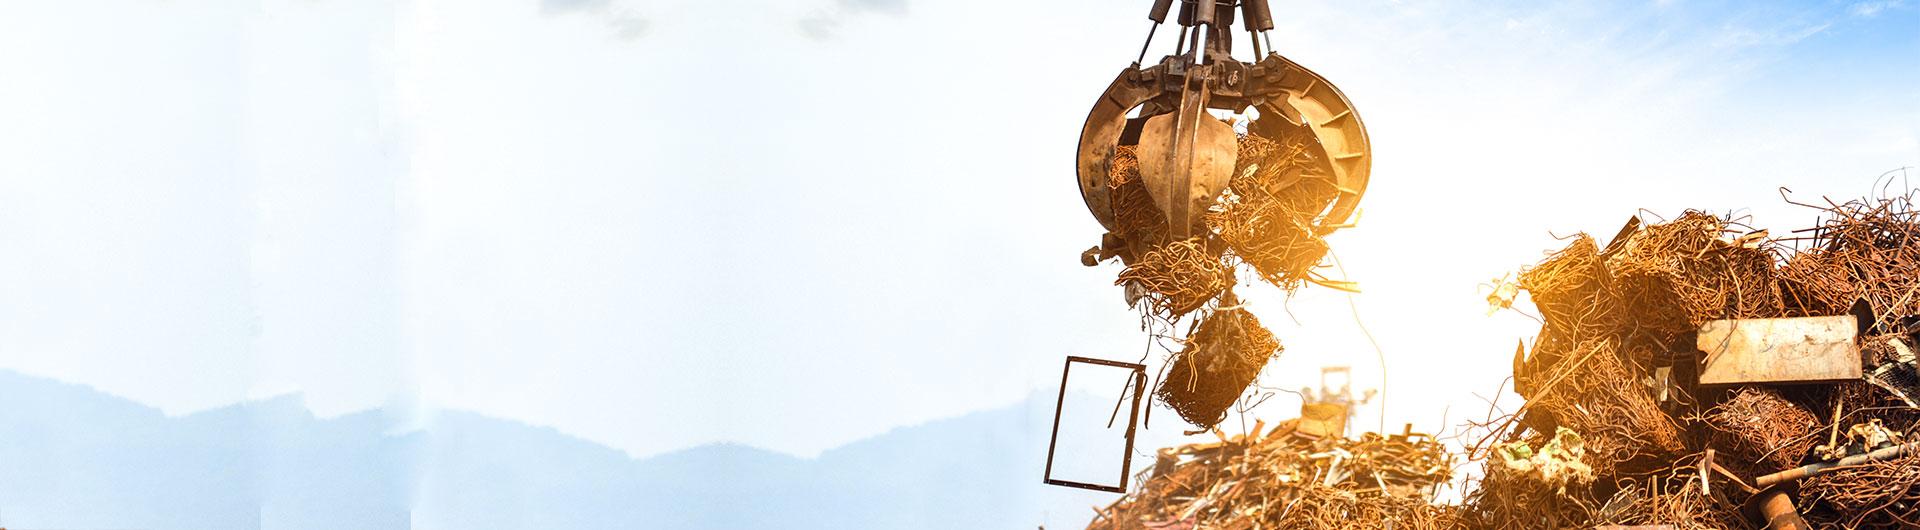 MGM-Recycling-&-Scrap-Metal-VARIOUS-TYPES-OF-SCRAP-METALS